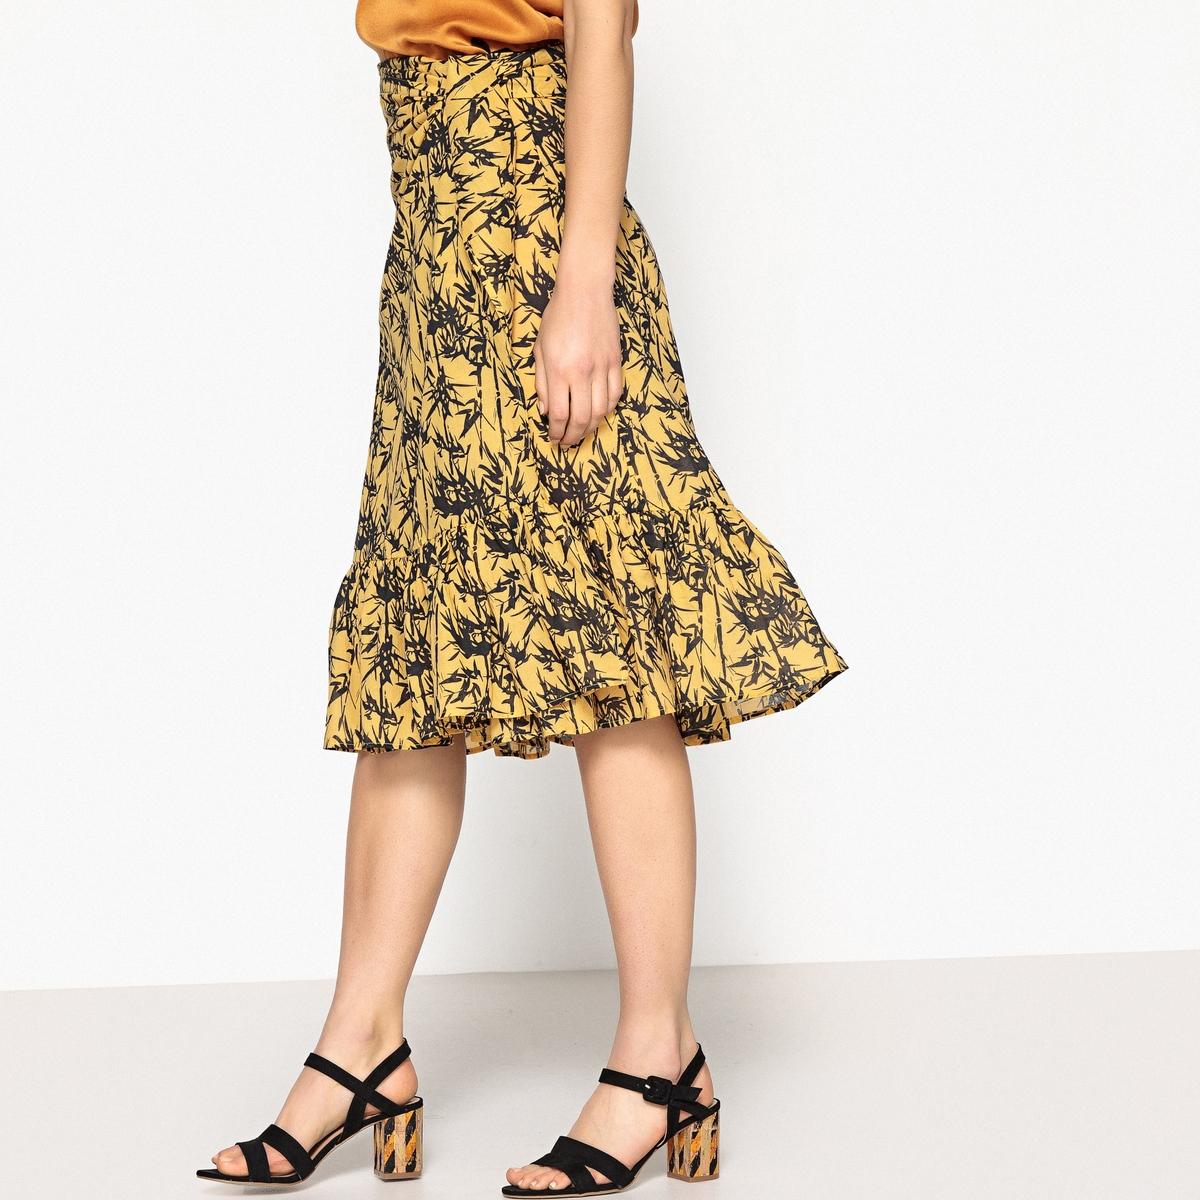 Юбка-миди с запахом с рисунком JOJO юбка миди однотонная с запахом